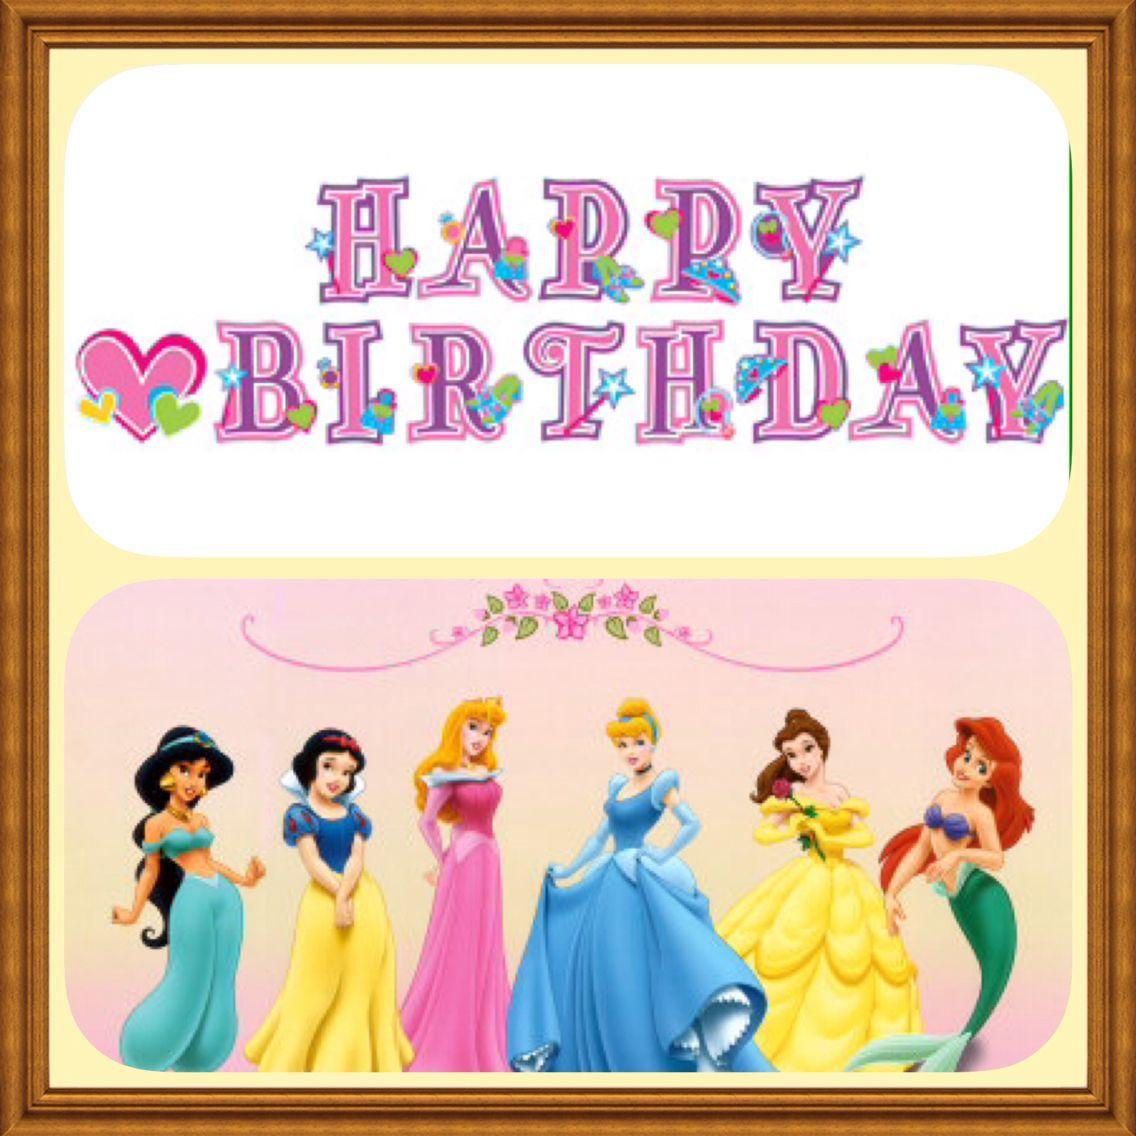 Disney Princess Happy Bithday Happy birthday kids, Happy